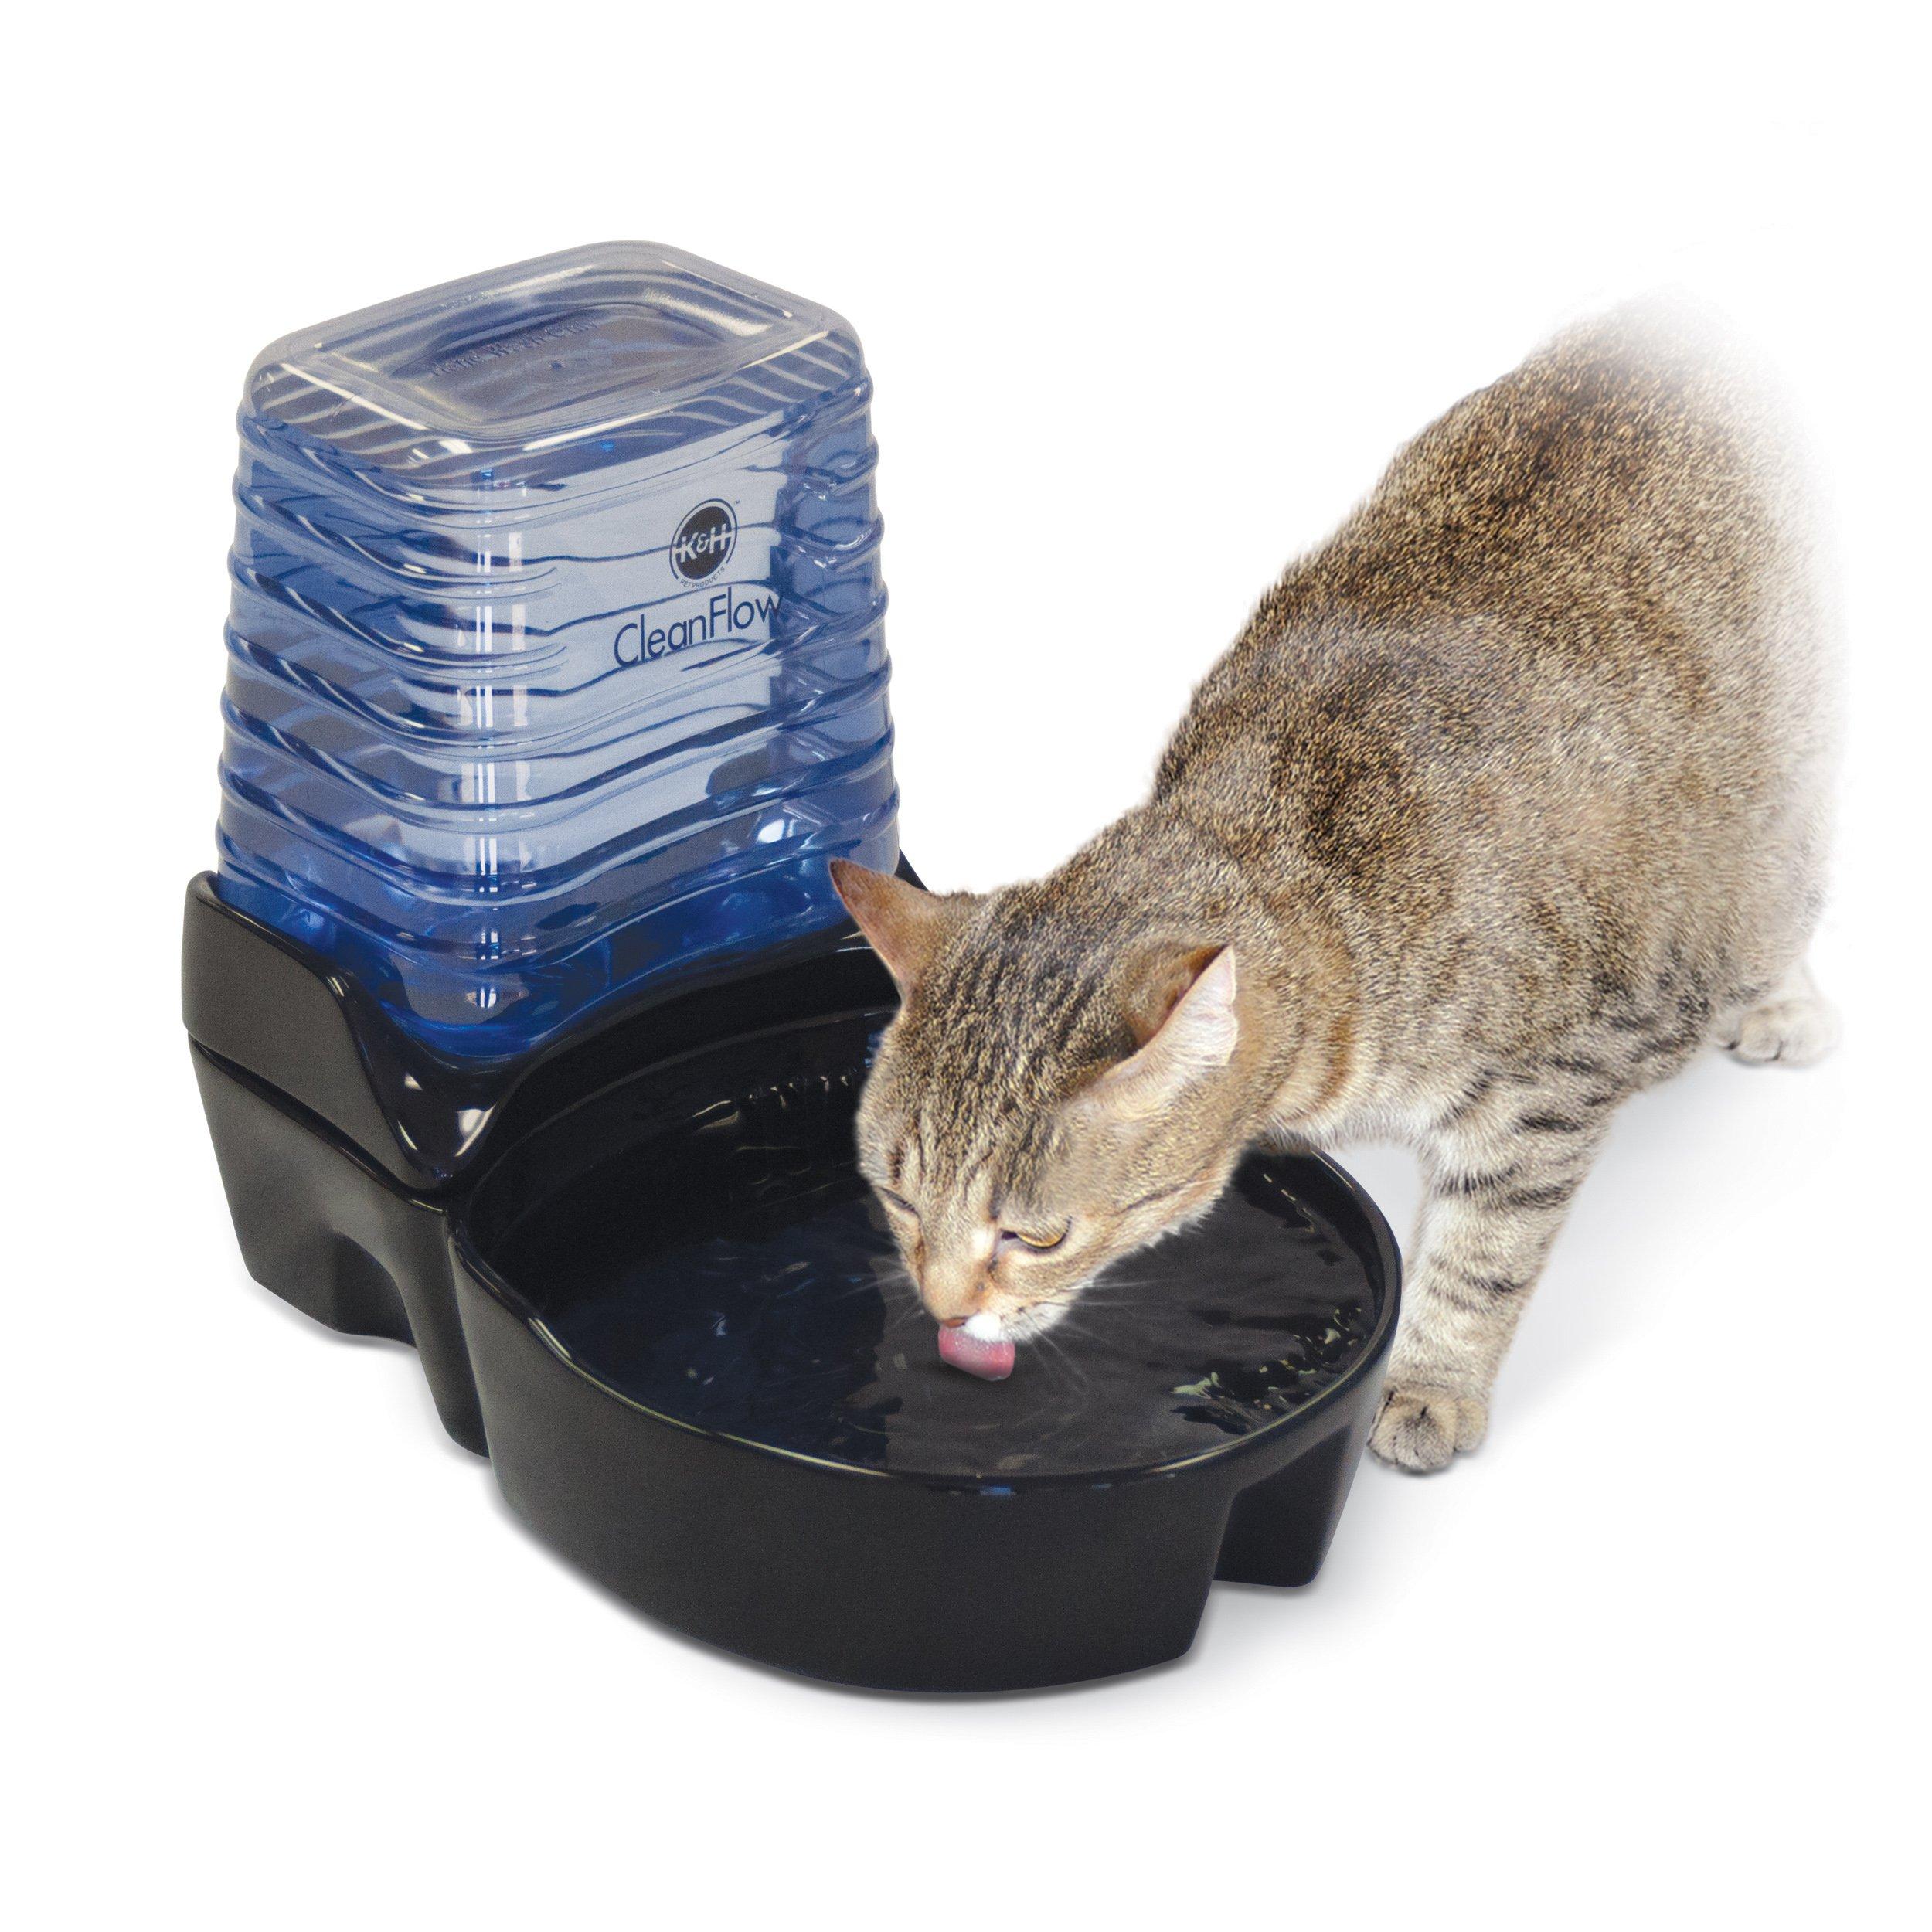 K&H Pet Products CleanFlow Filtered Pet Water Bowl Ceramic With Reservoir Cat 80oz. + 90oz. Black